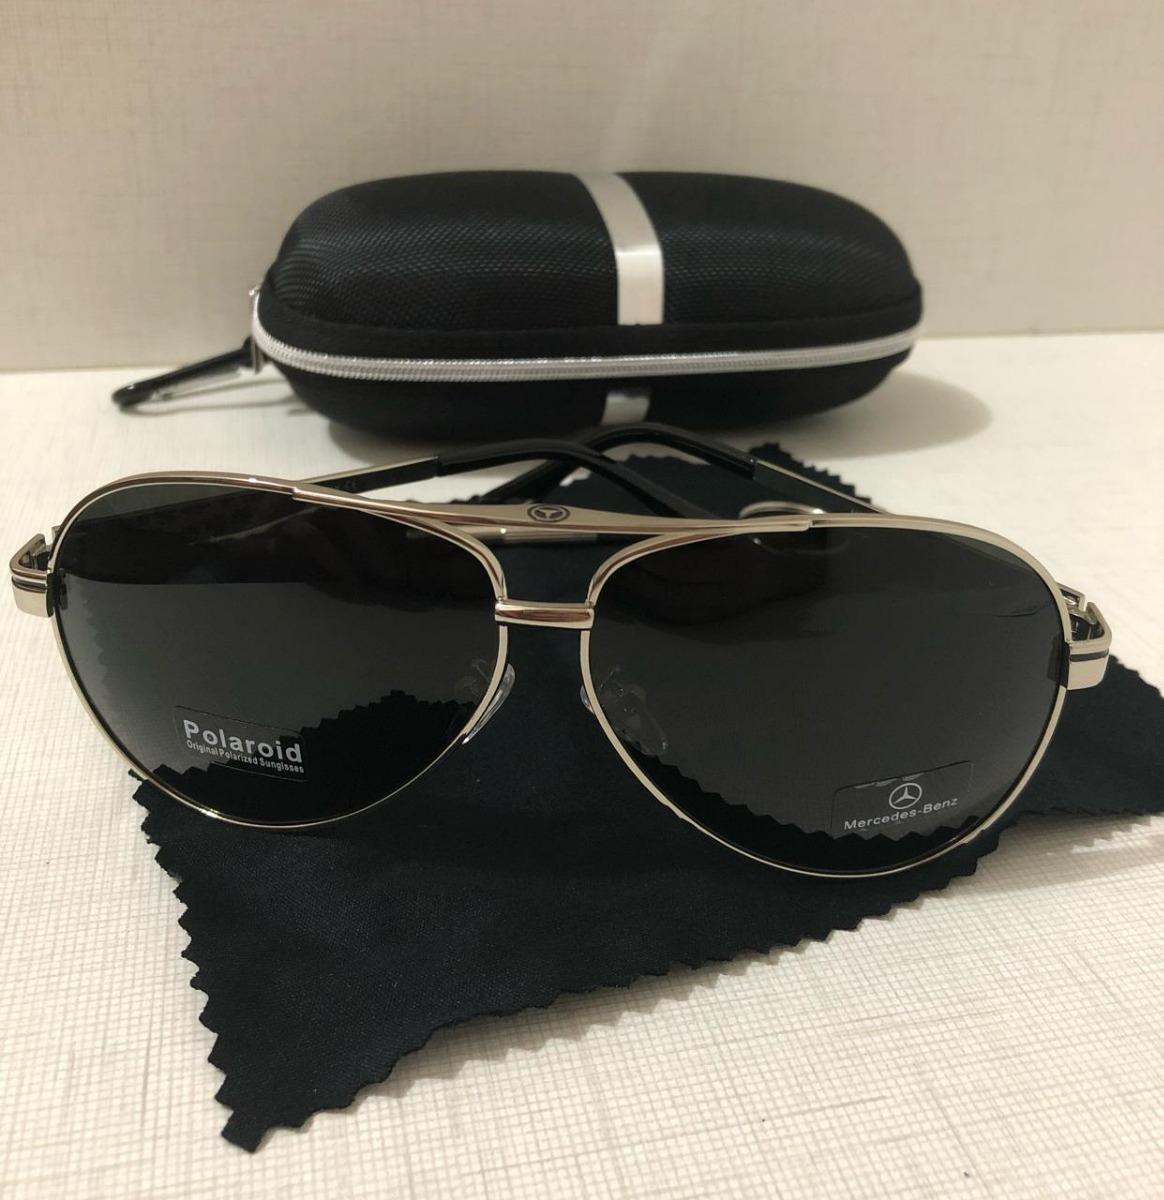 a77bd2031 óculos sol mercedes benz polarizado uv400 pronta entrega. Carregando zoom.